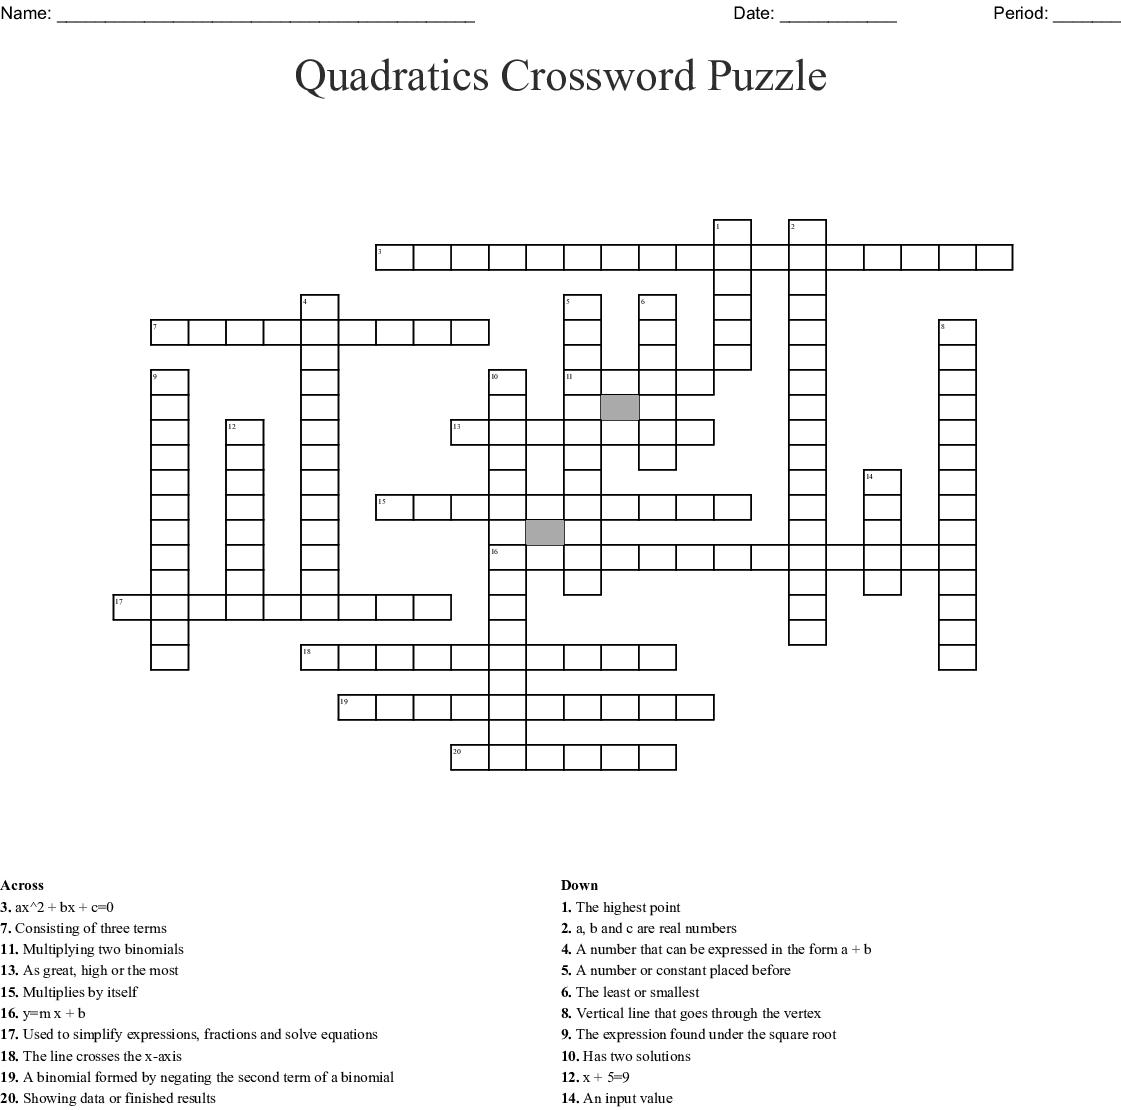 Quadratics Crossword Puzzle - WordMint